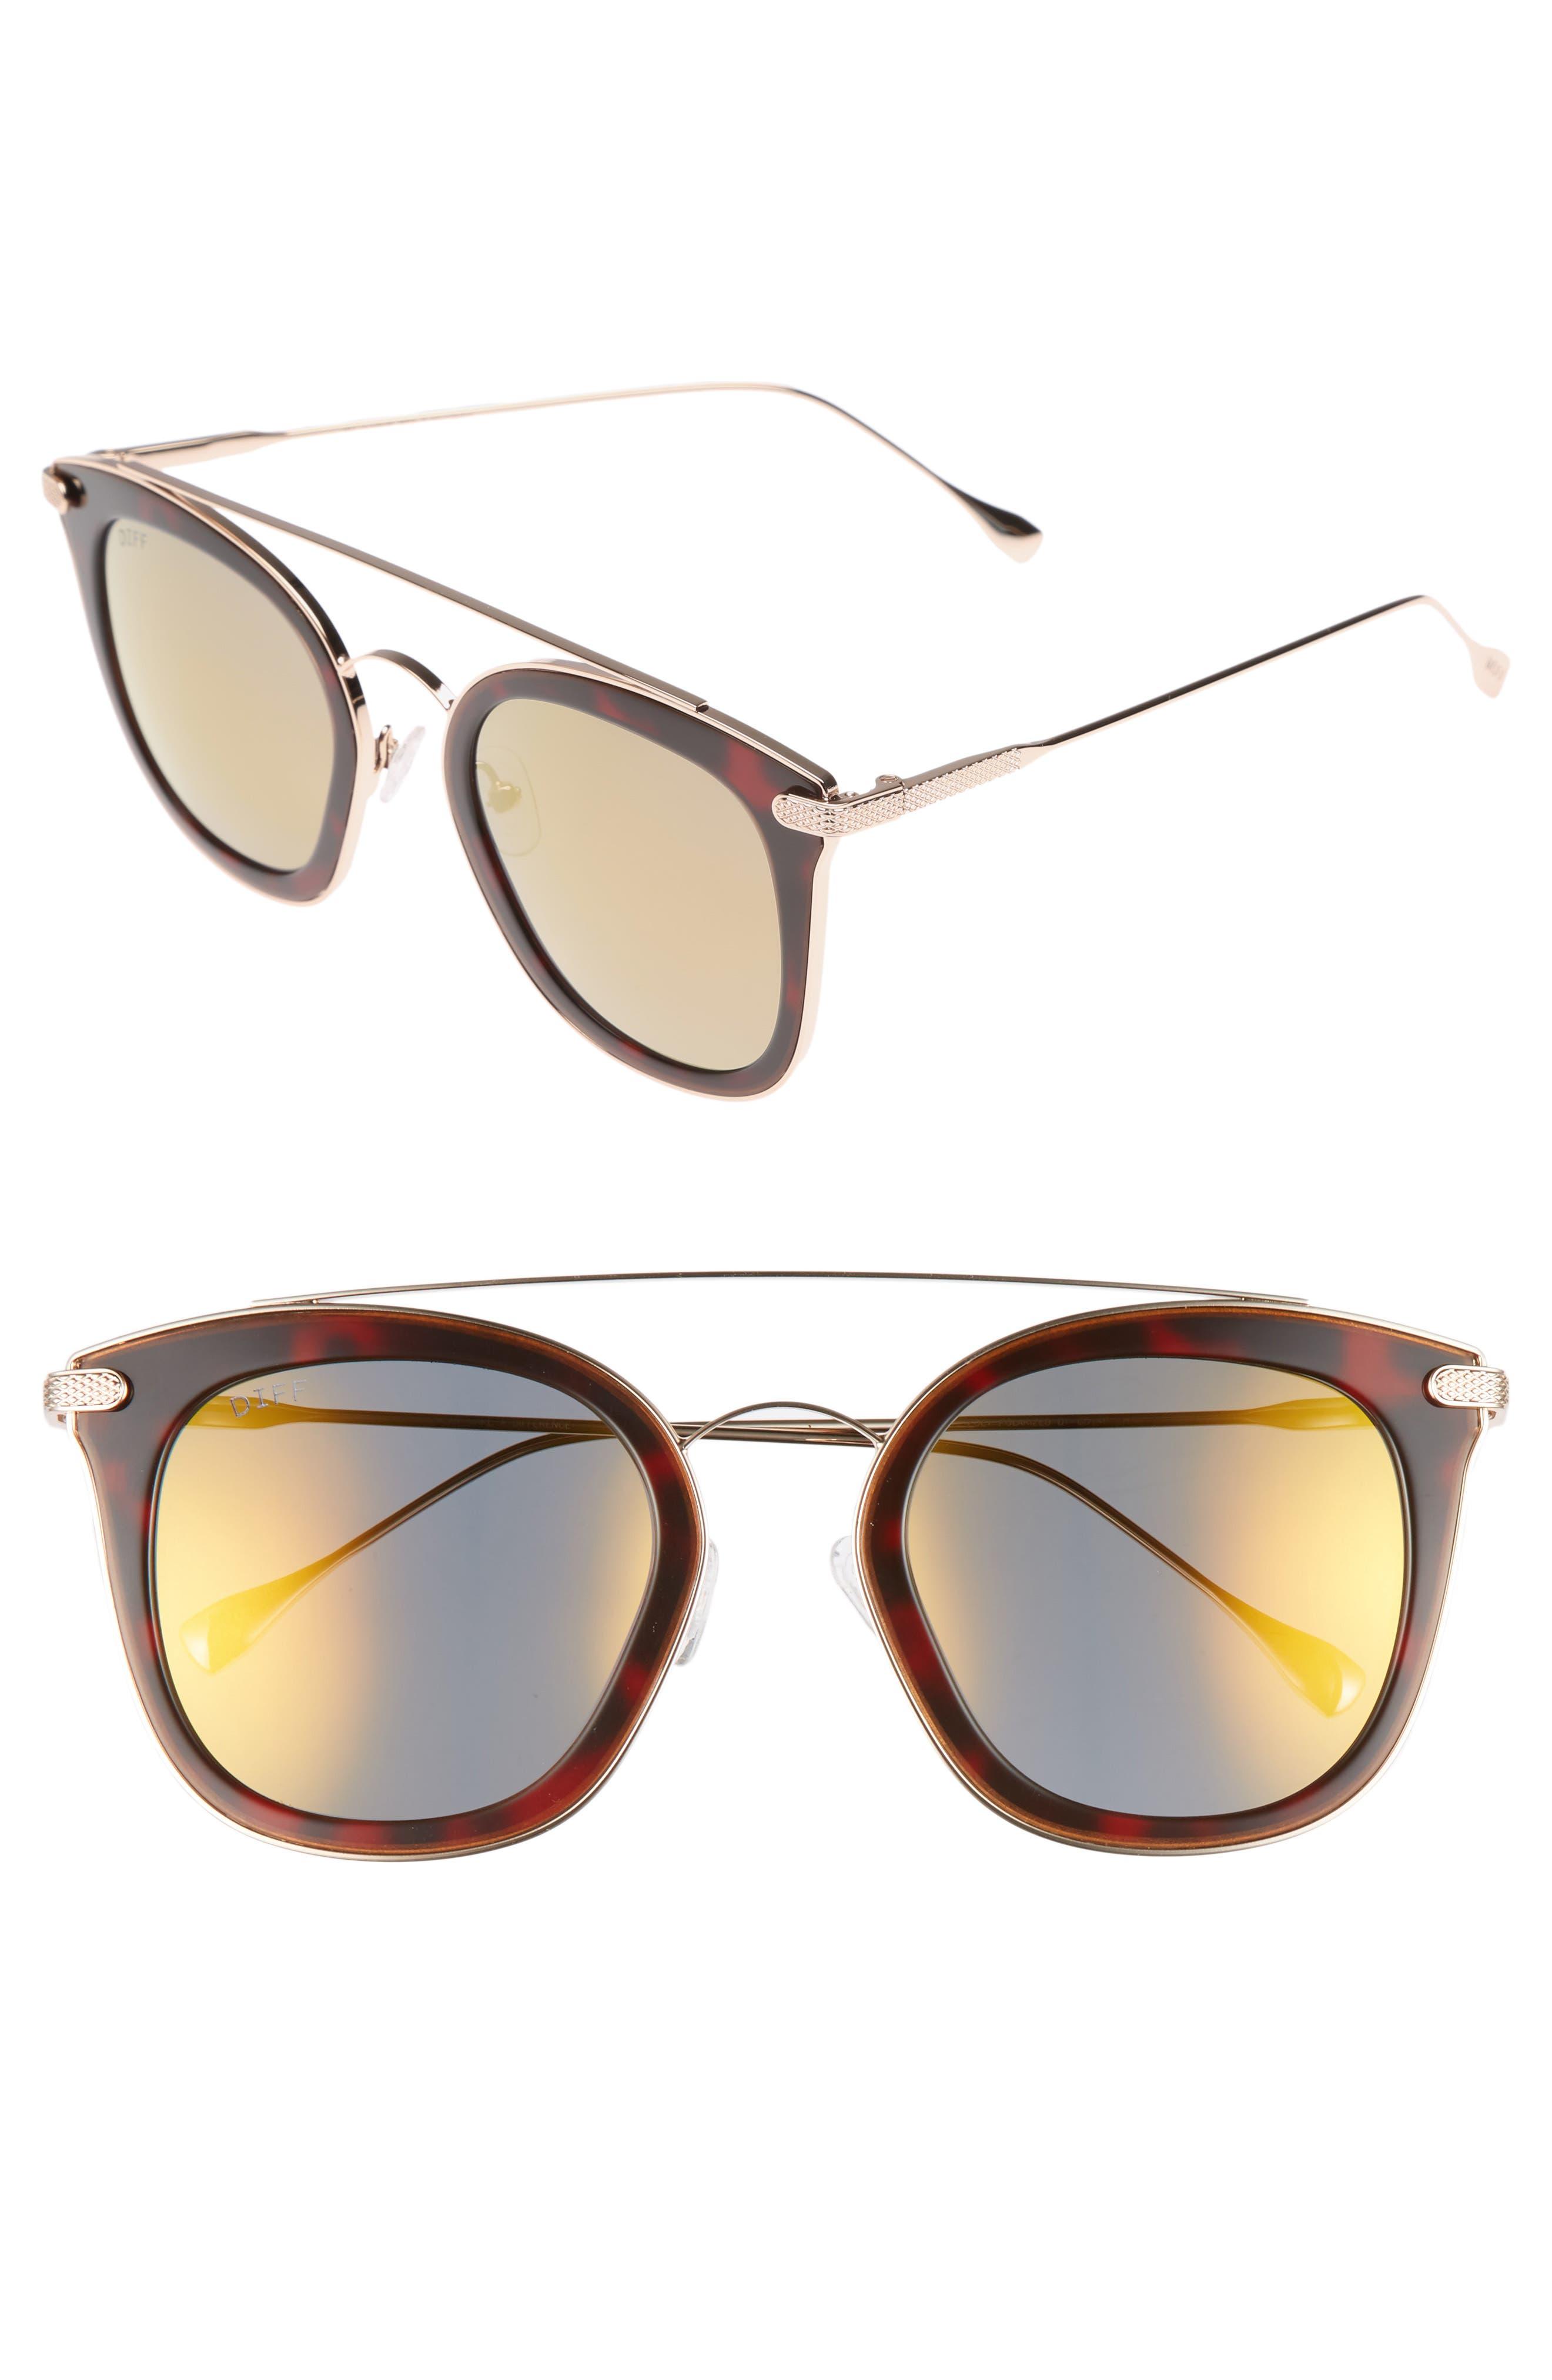 Zoey 51mm Polarized Sunglasses,                         Main,                         color, Tortoise/ Gold